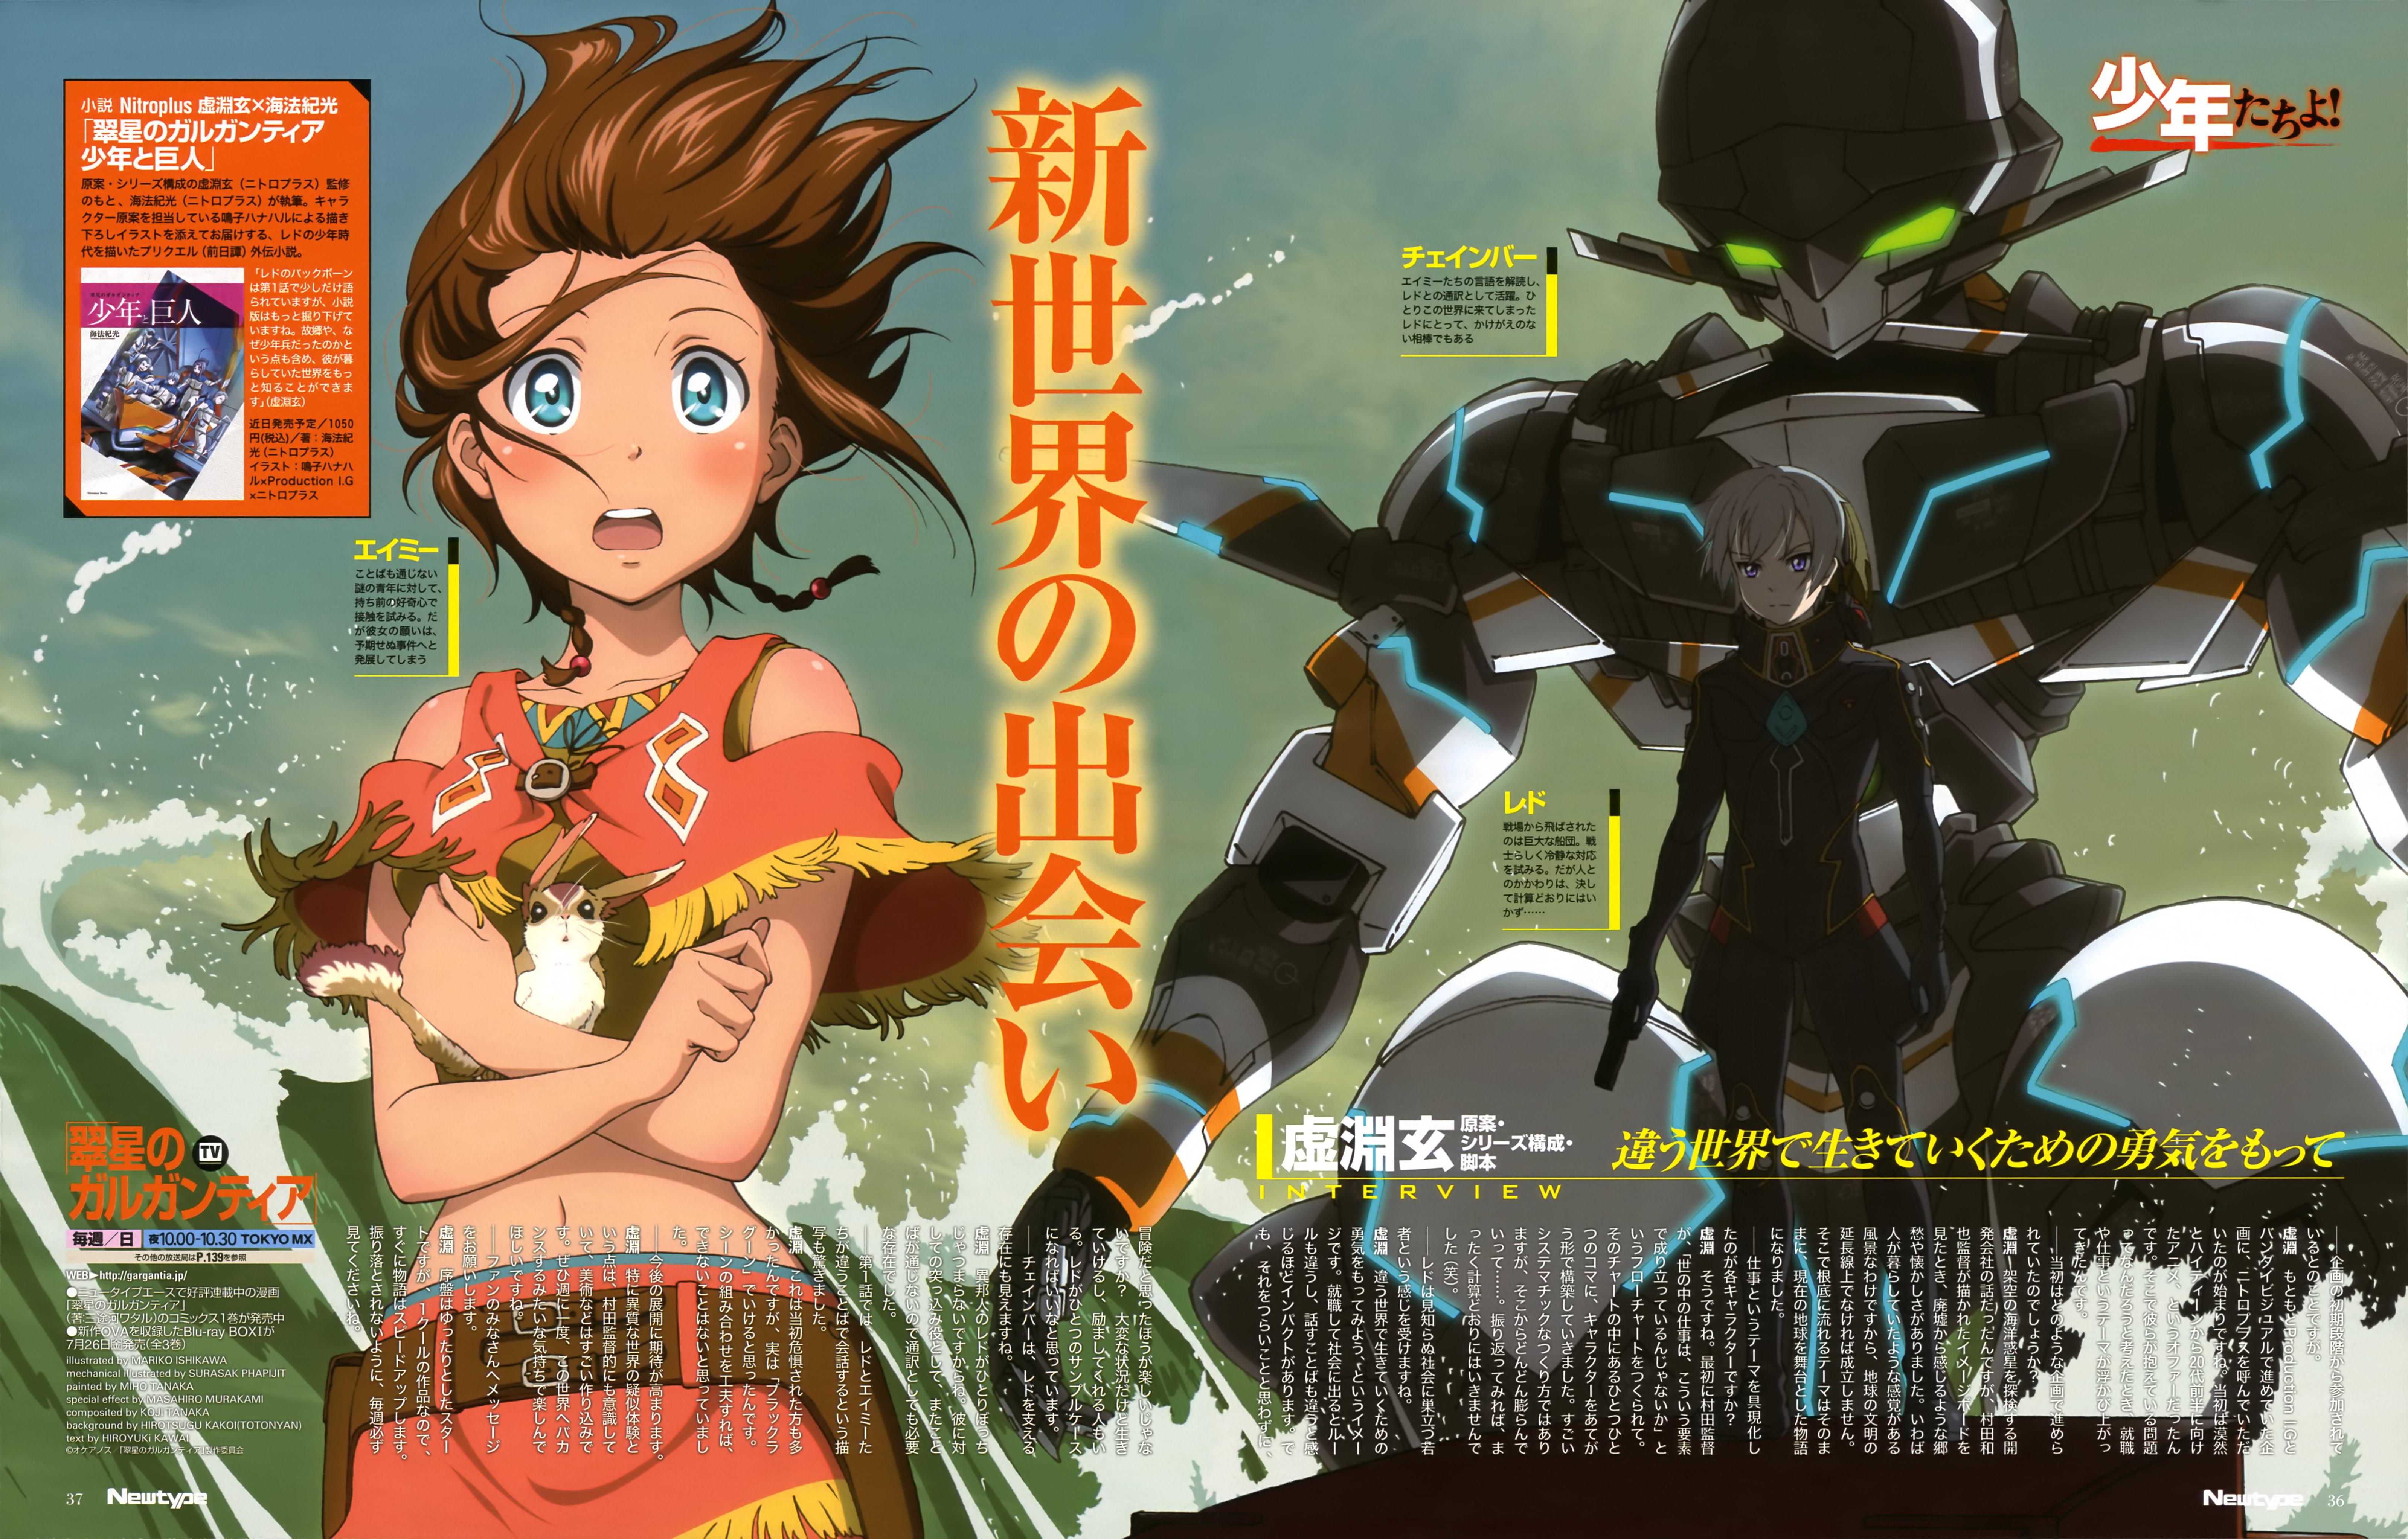 Amy (Suisei no Gargantia) | page 5 of 5 - Zerochan Anime Image Board